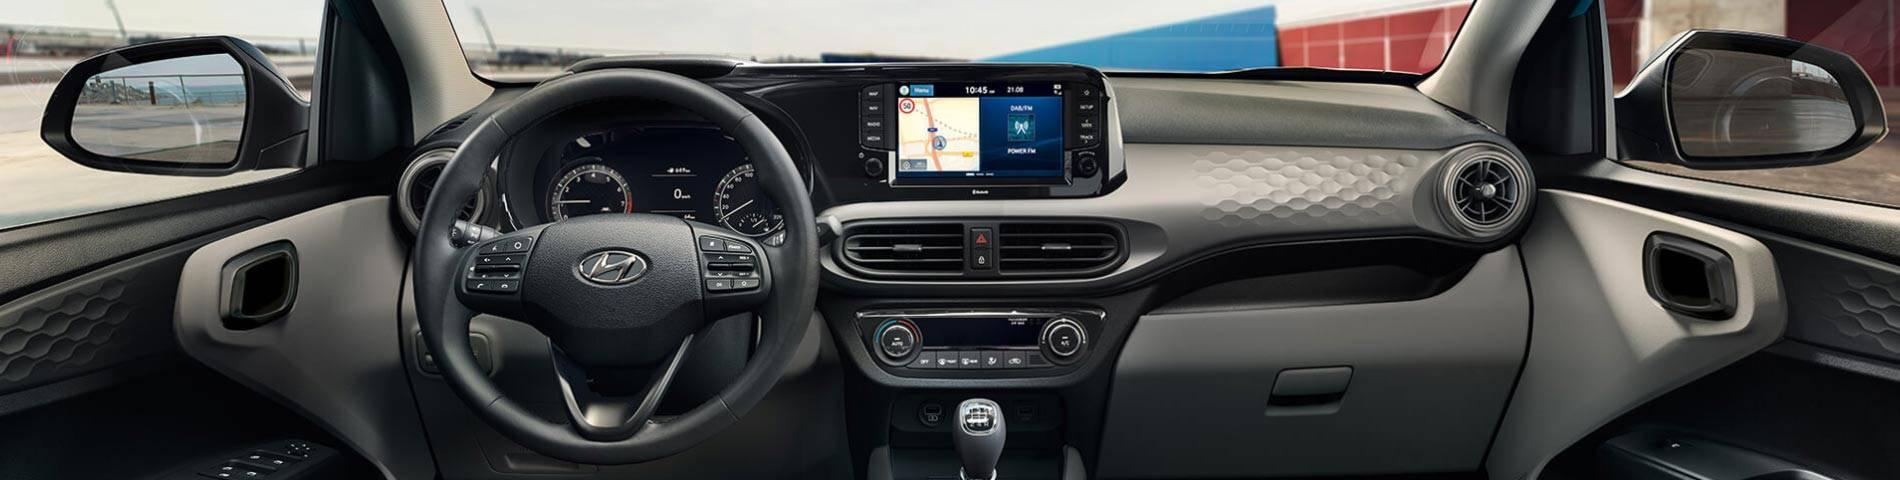 all-new-hyundai-i10-interior-view